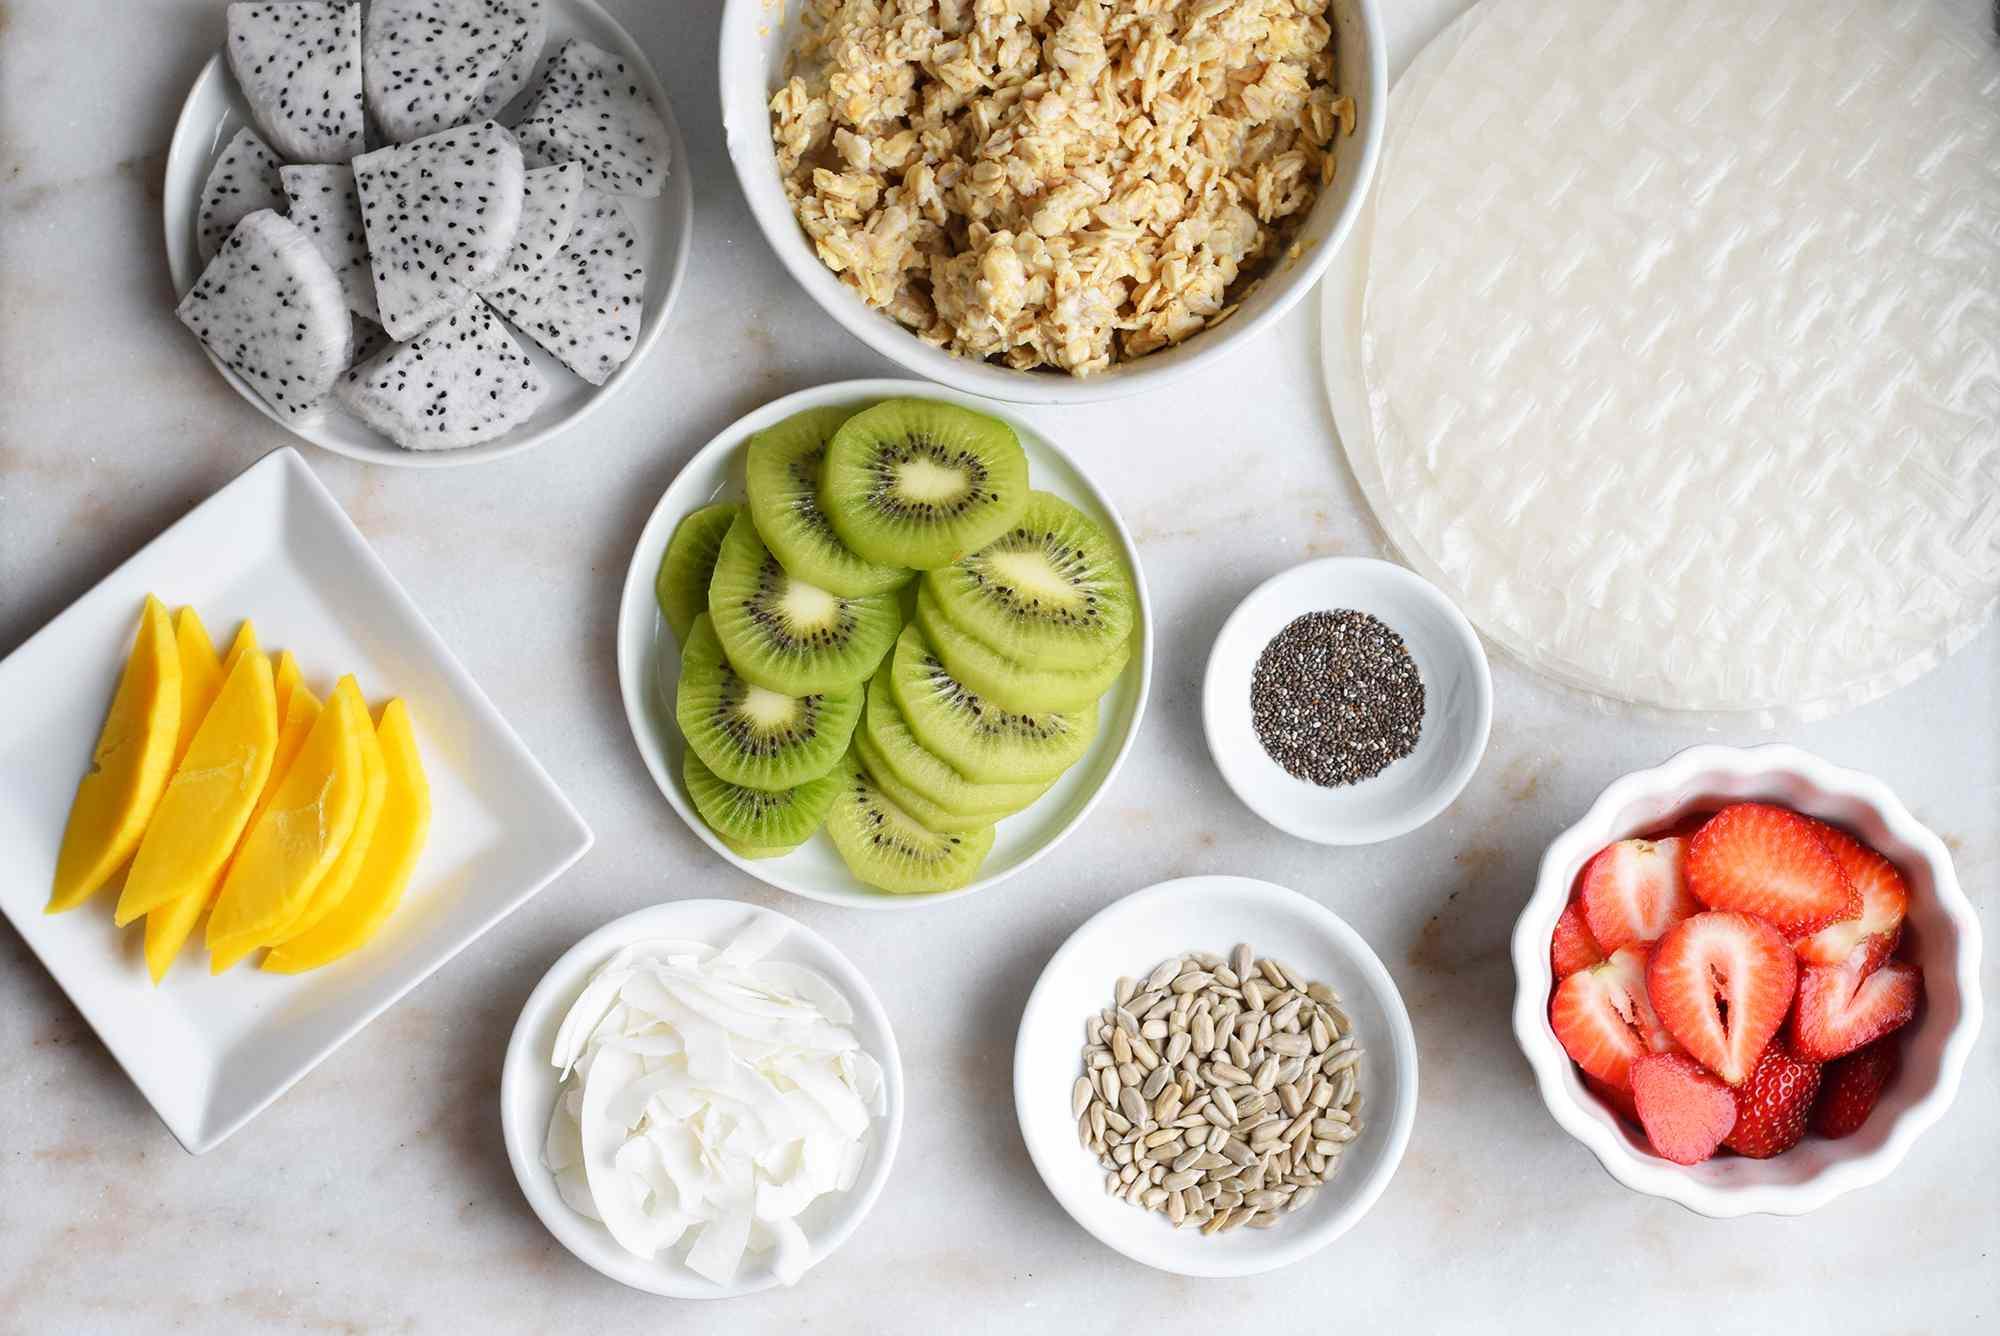 ingredients for sweet breakfast summer rolls